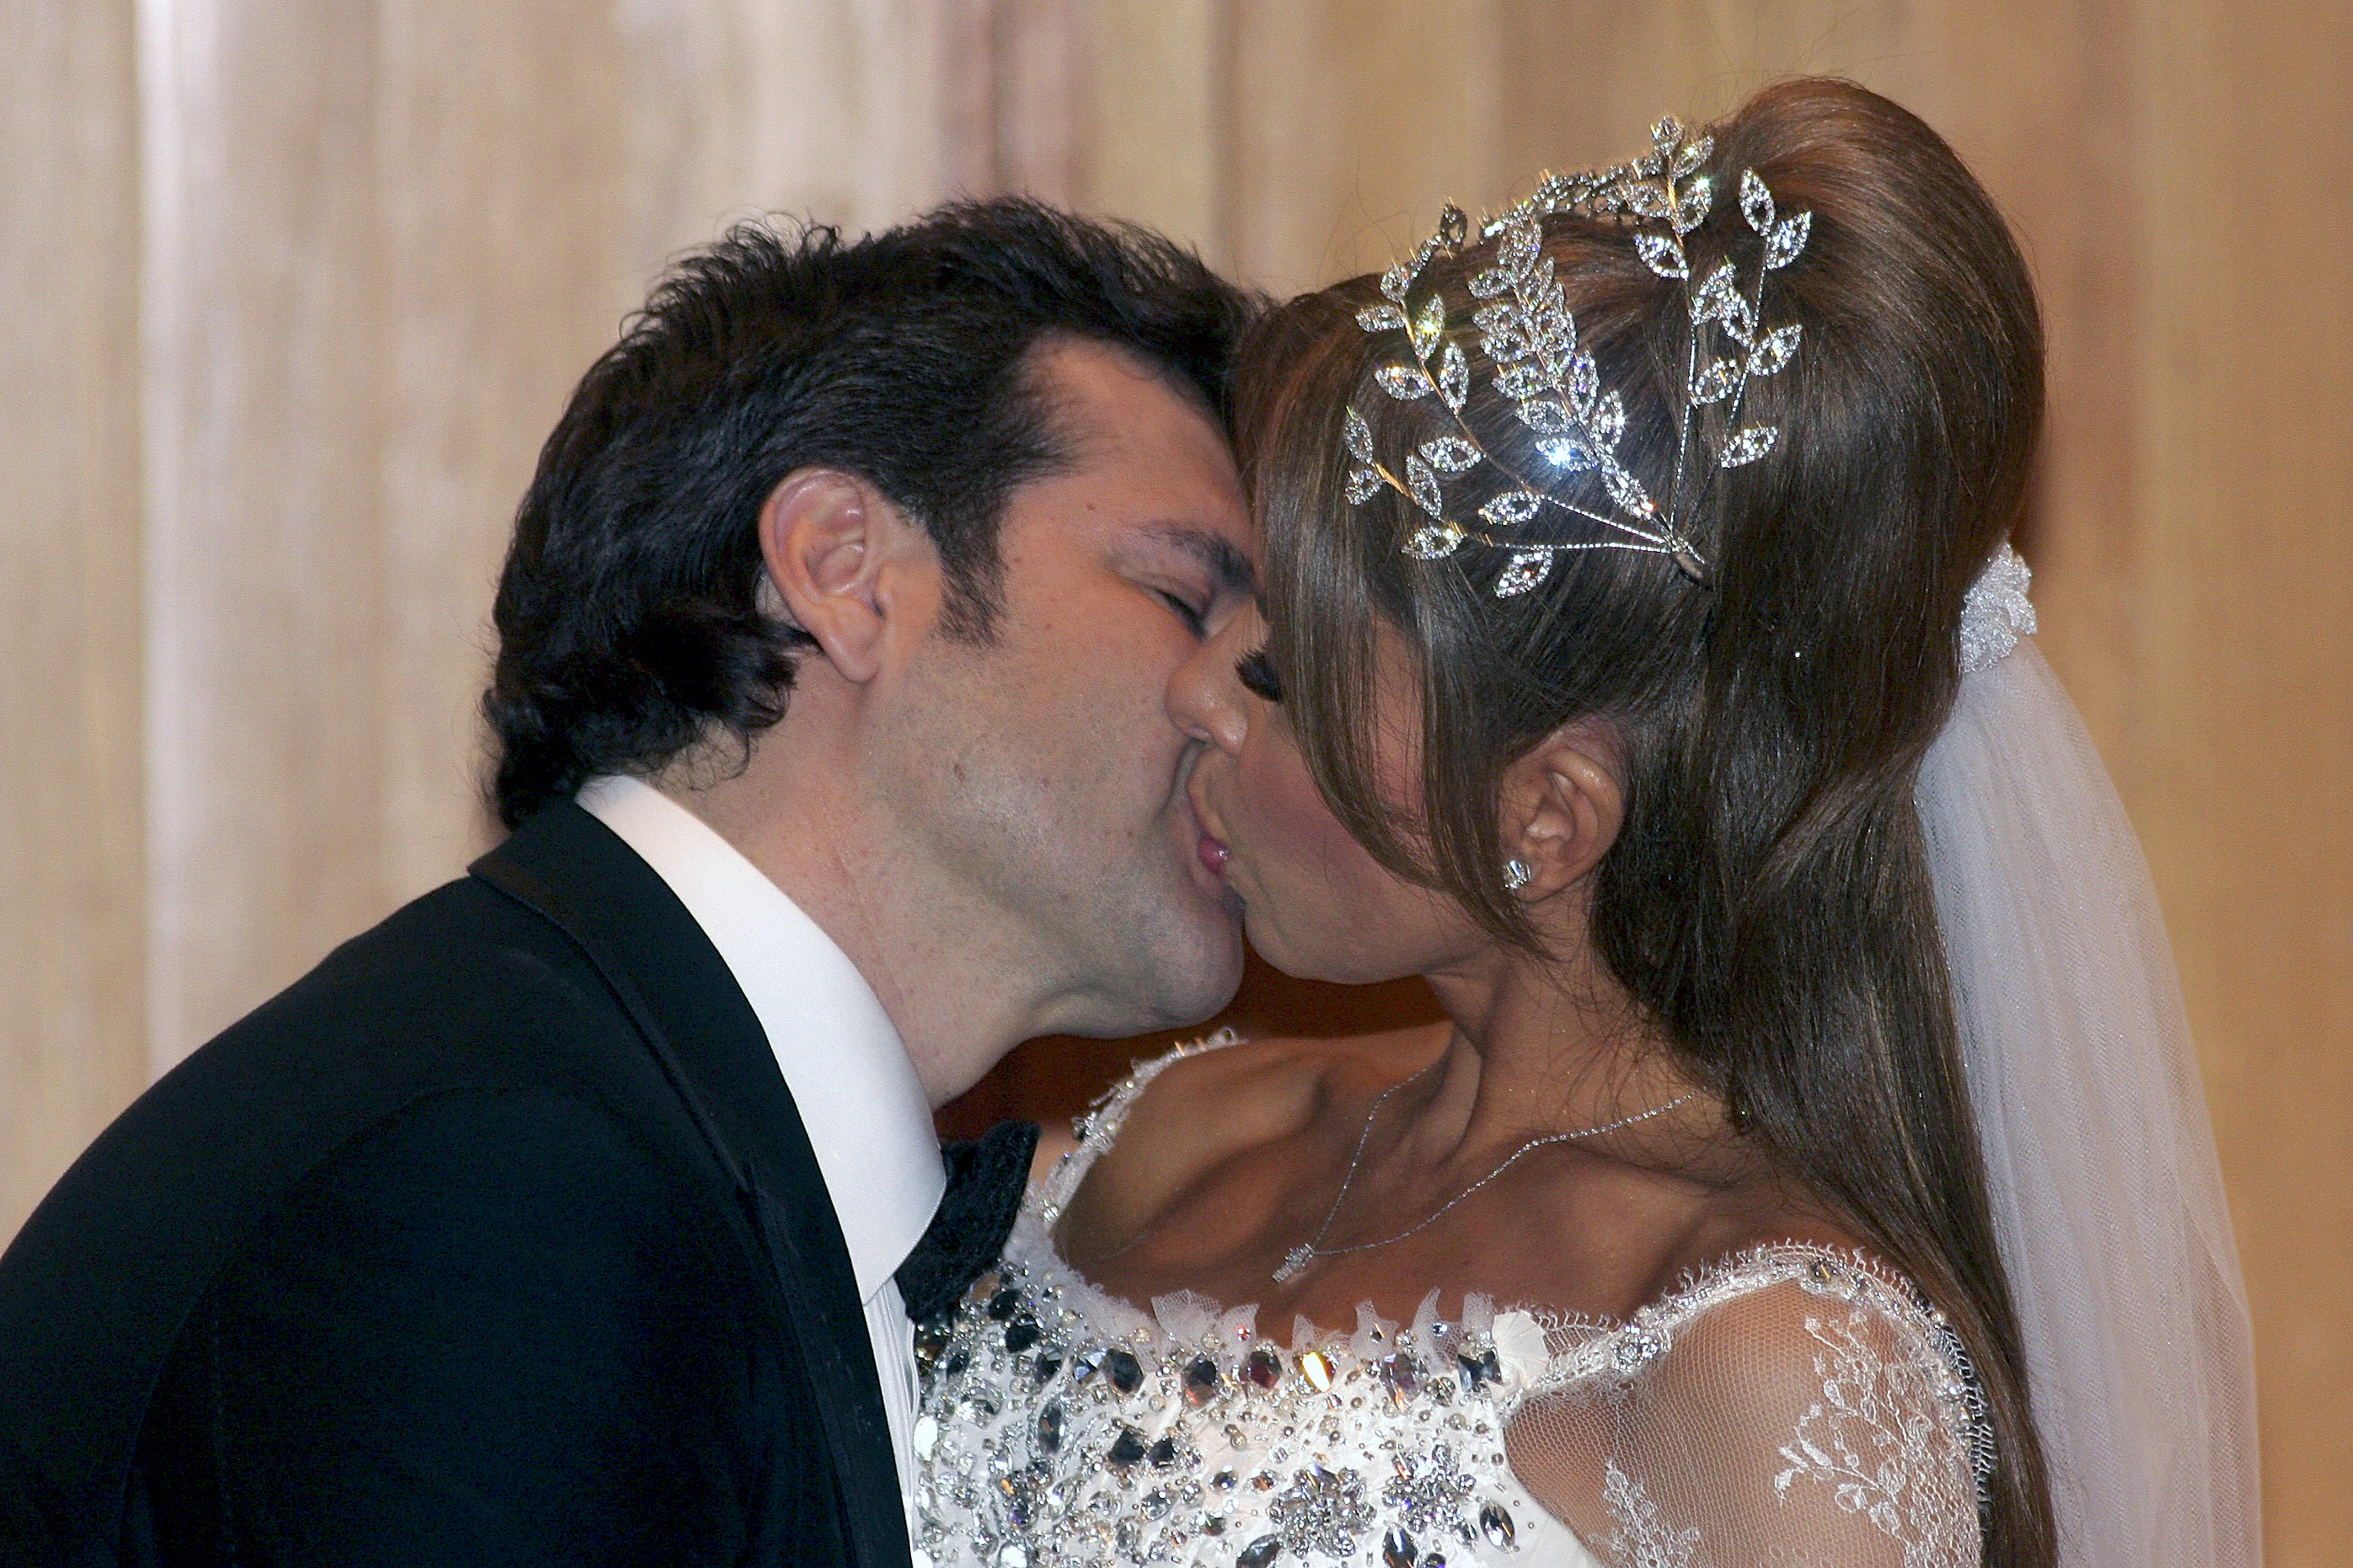 Alfredo Lopez/Jam Media/LatinContent/Getty Images